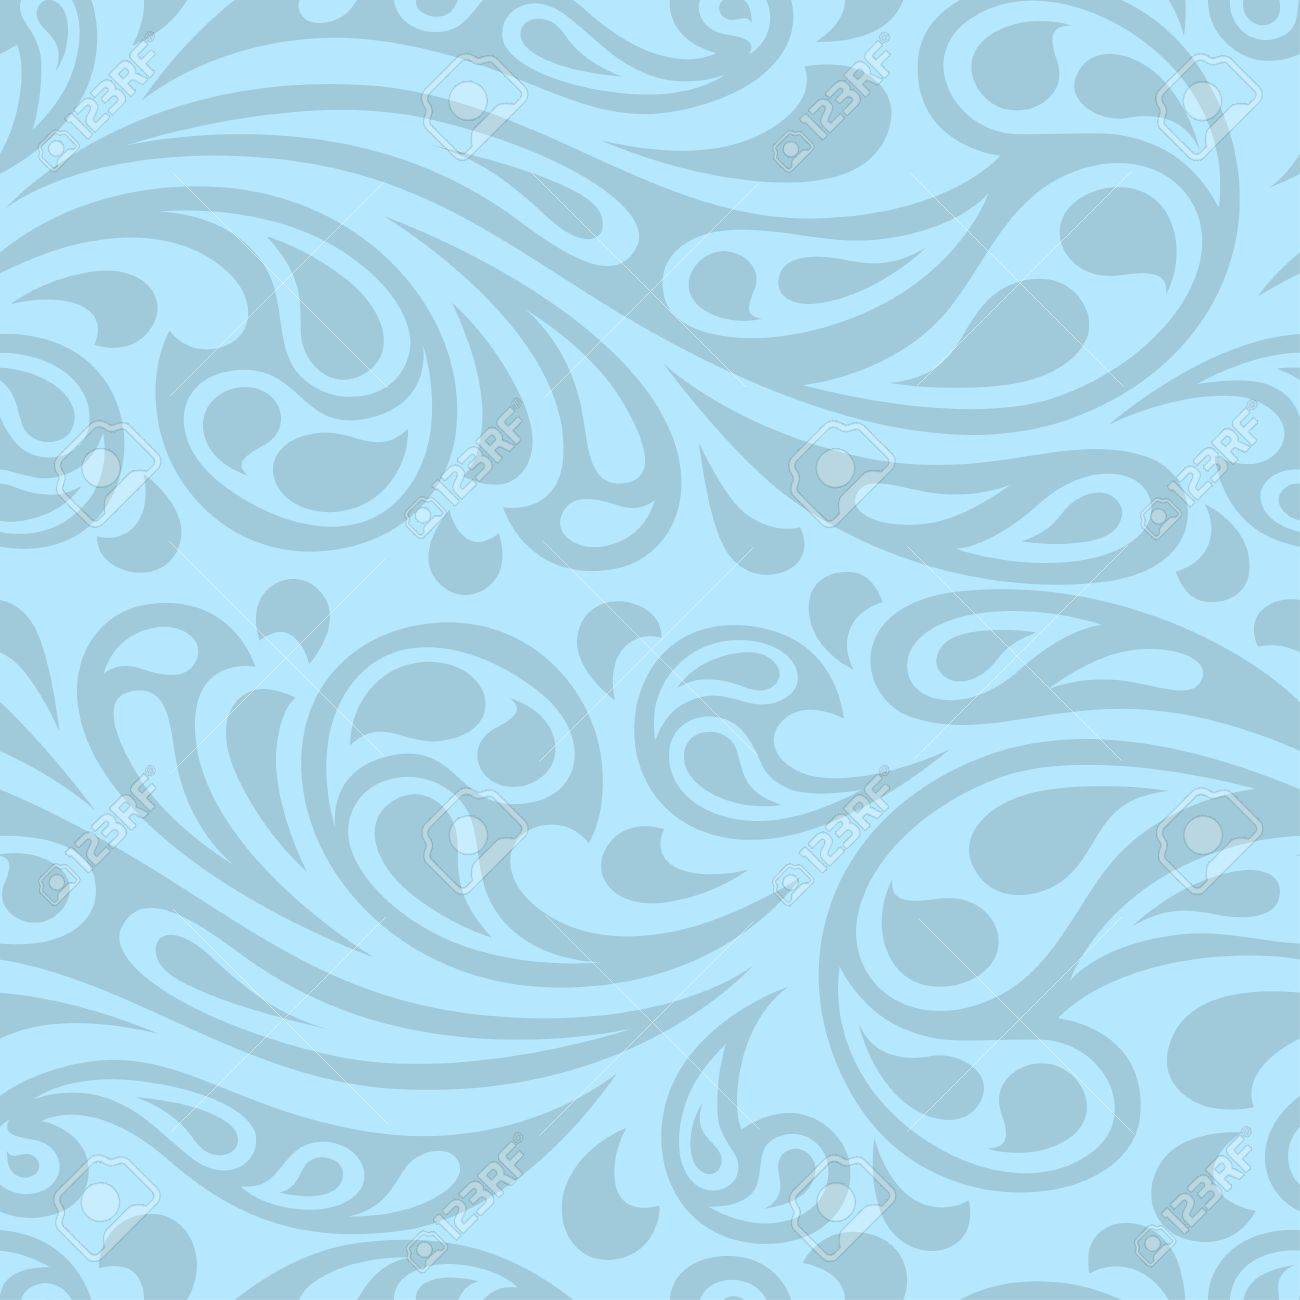 Water splash seamless waves abstract pattern. - 22599014